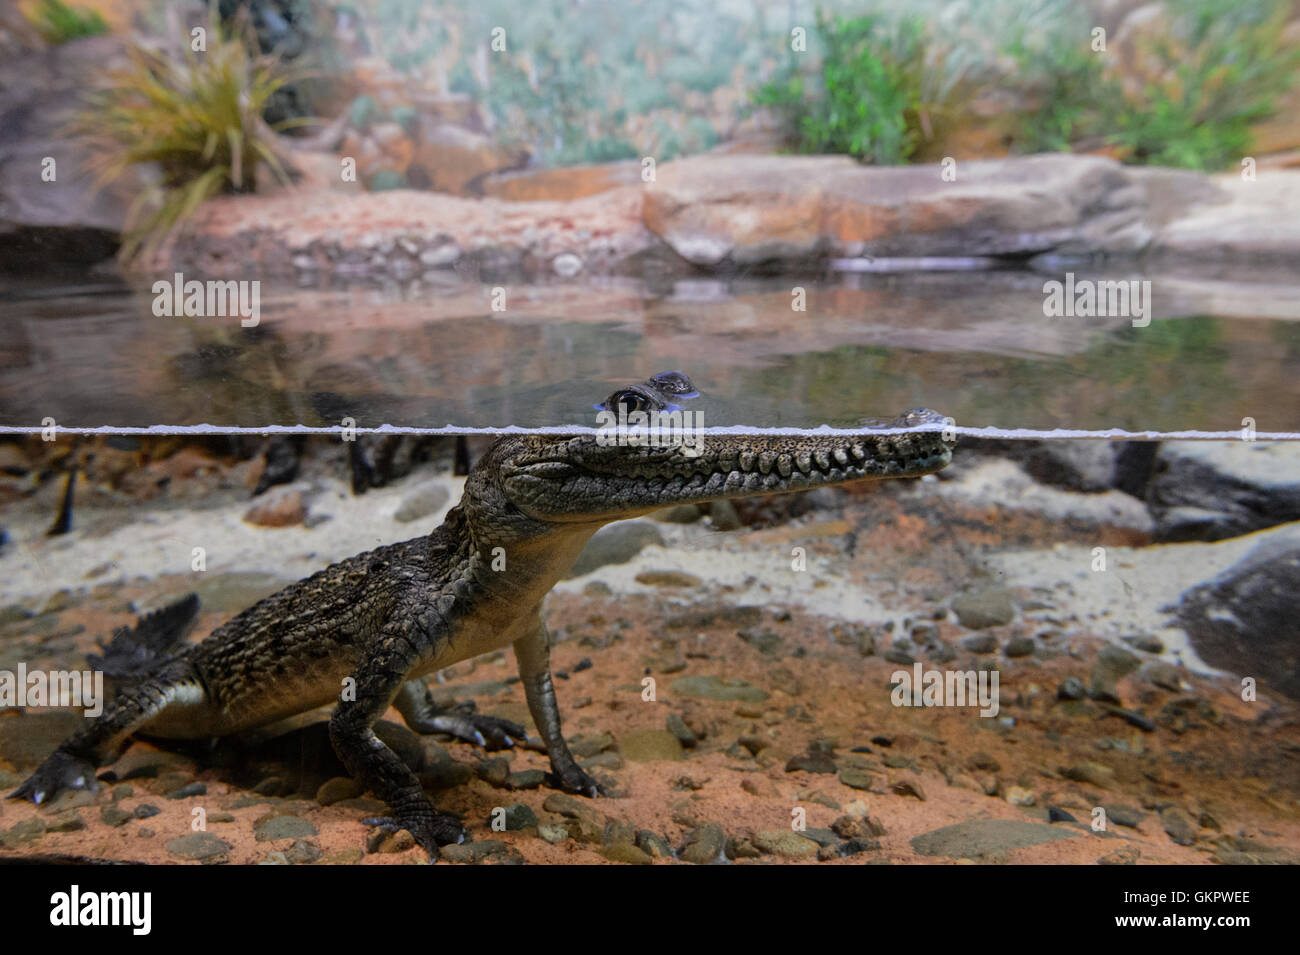 Young Freshwater Crocodile (Crocodylus johnstoni), Australia - Stock Image